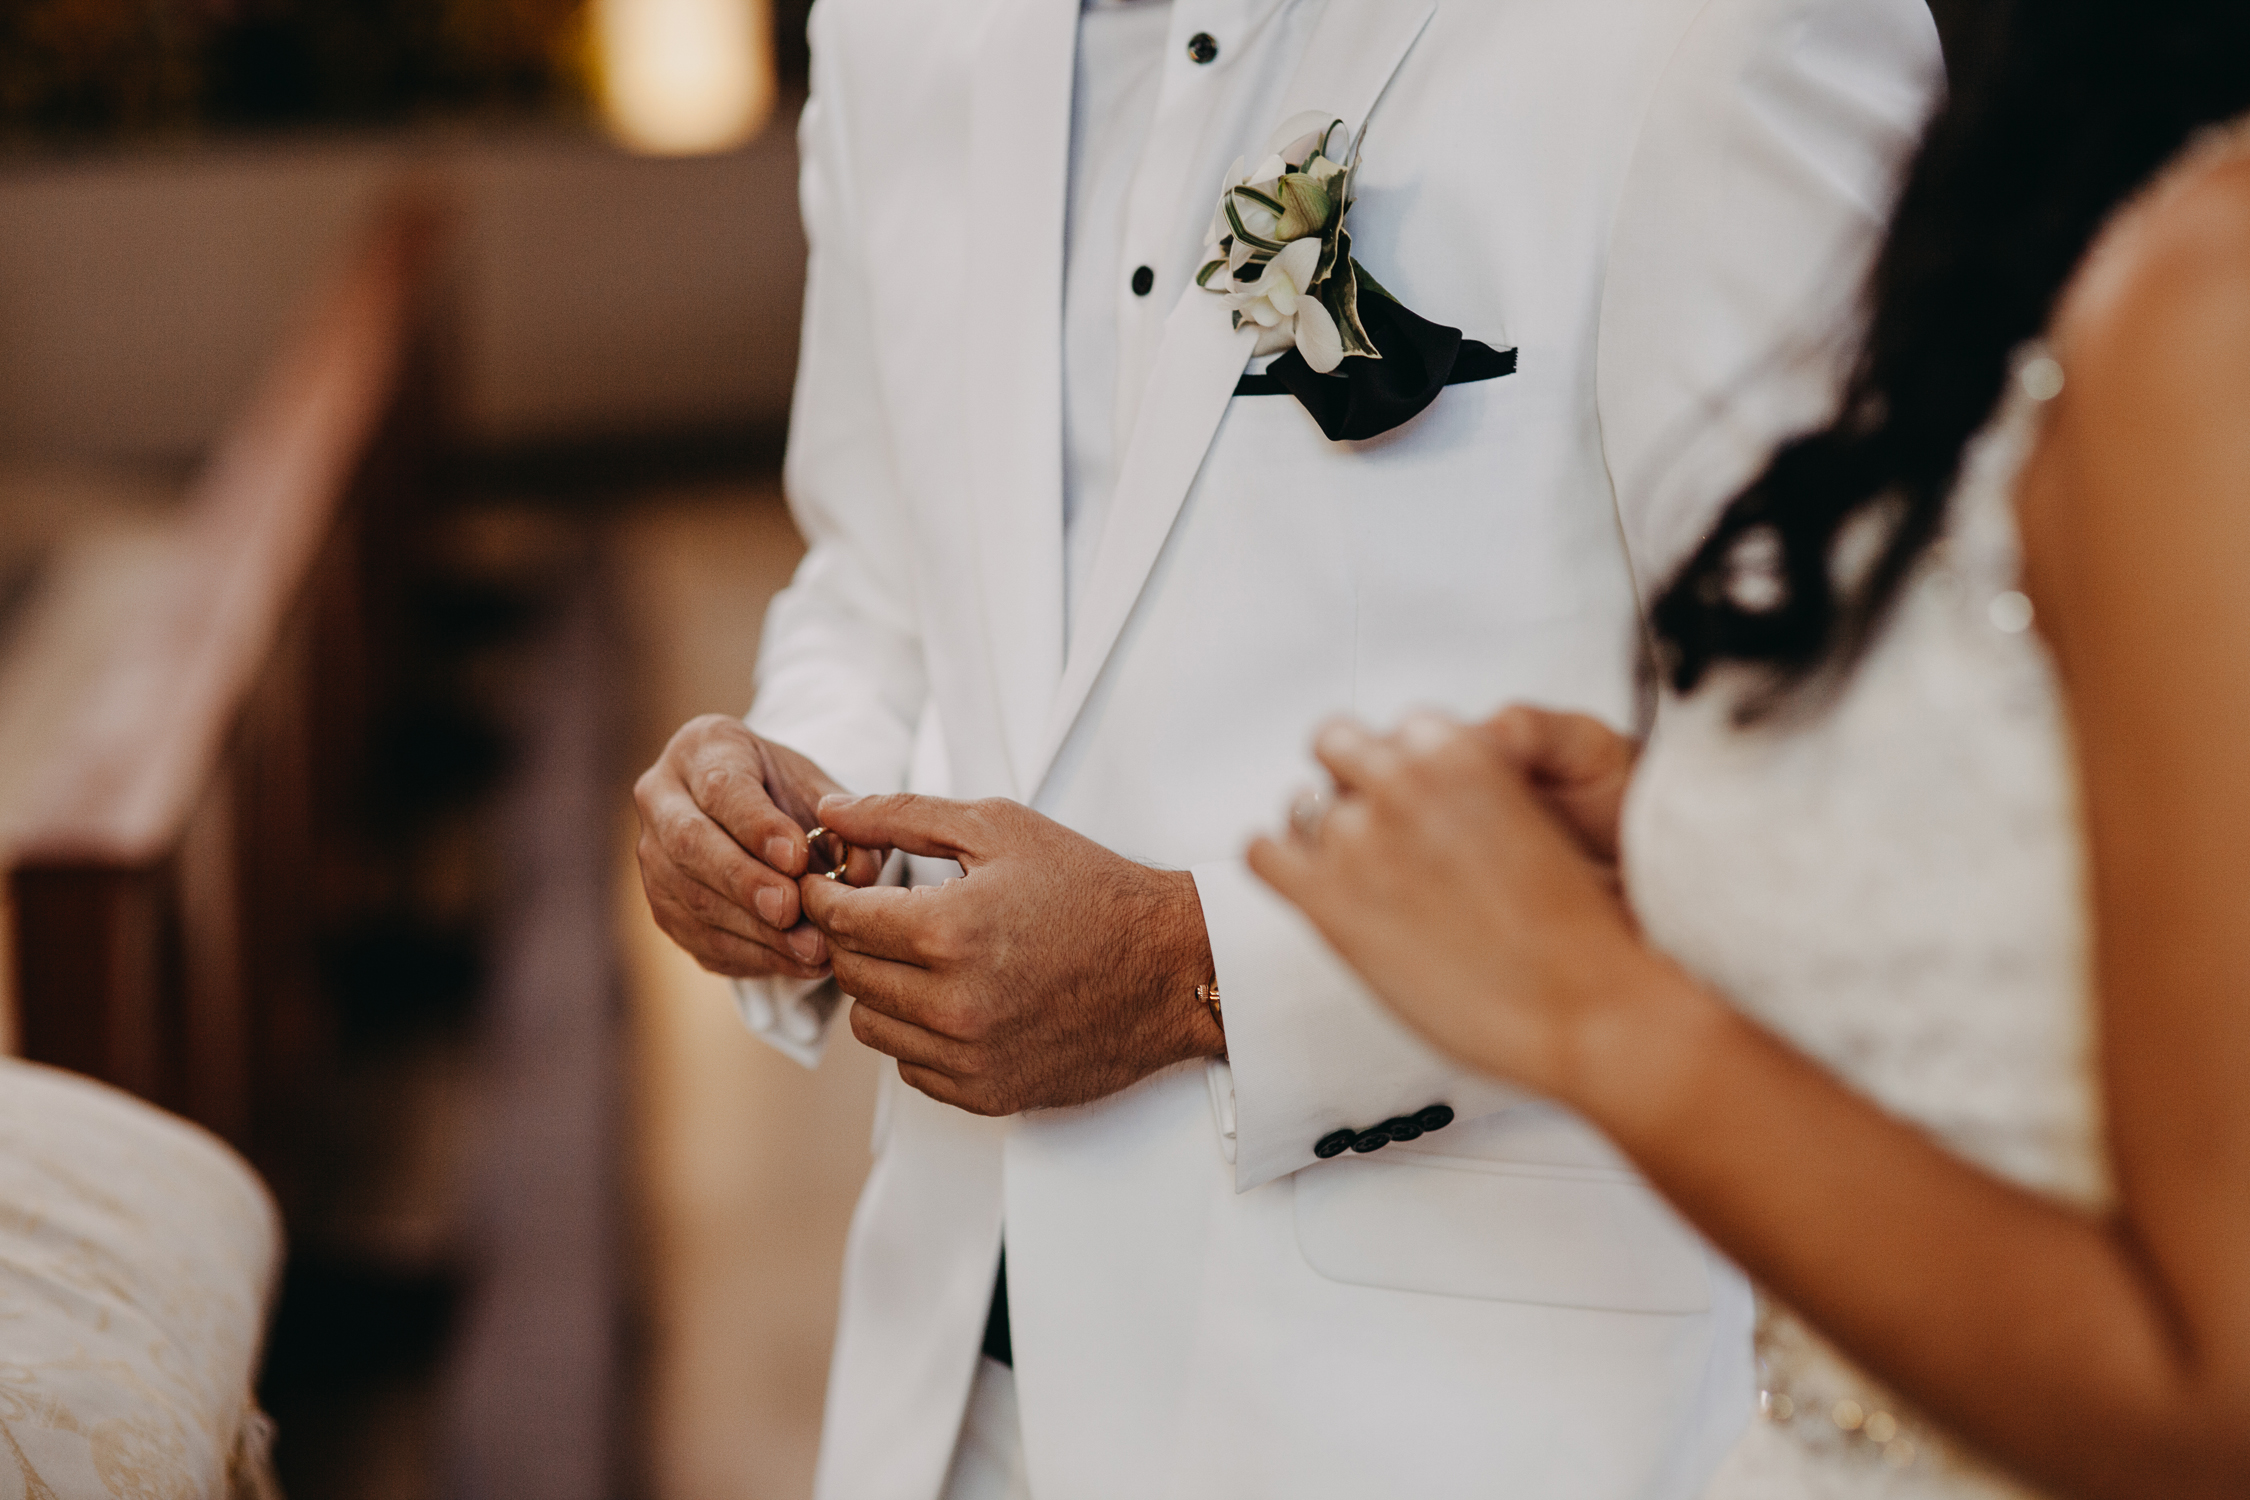 Michelle-Agurto-Fotografia-Bodas-Ecuador-Destination-Wedding-Photographer-Daniela-Dirk-8.JPG